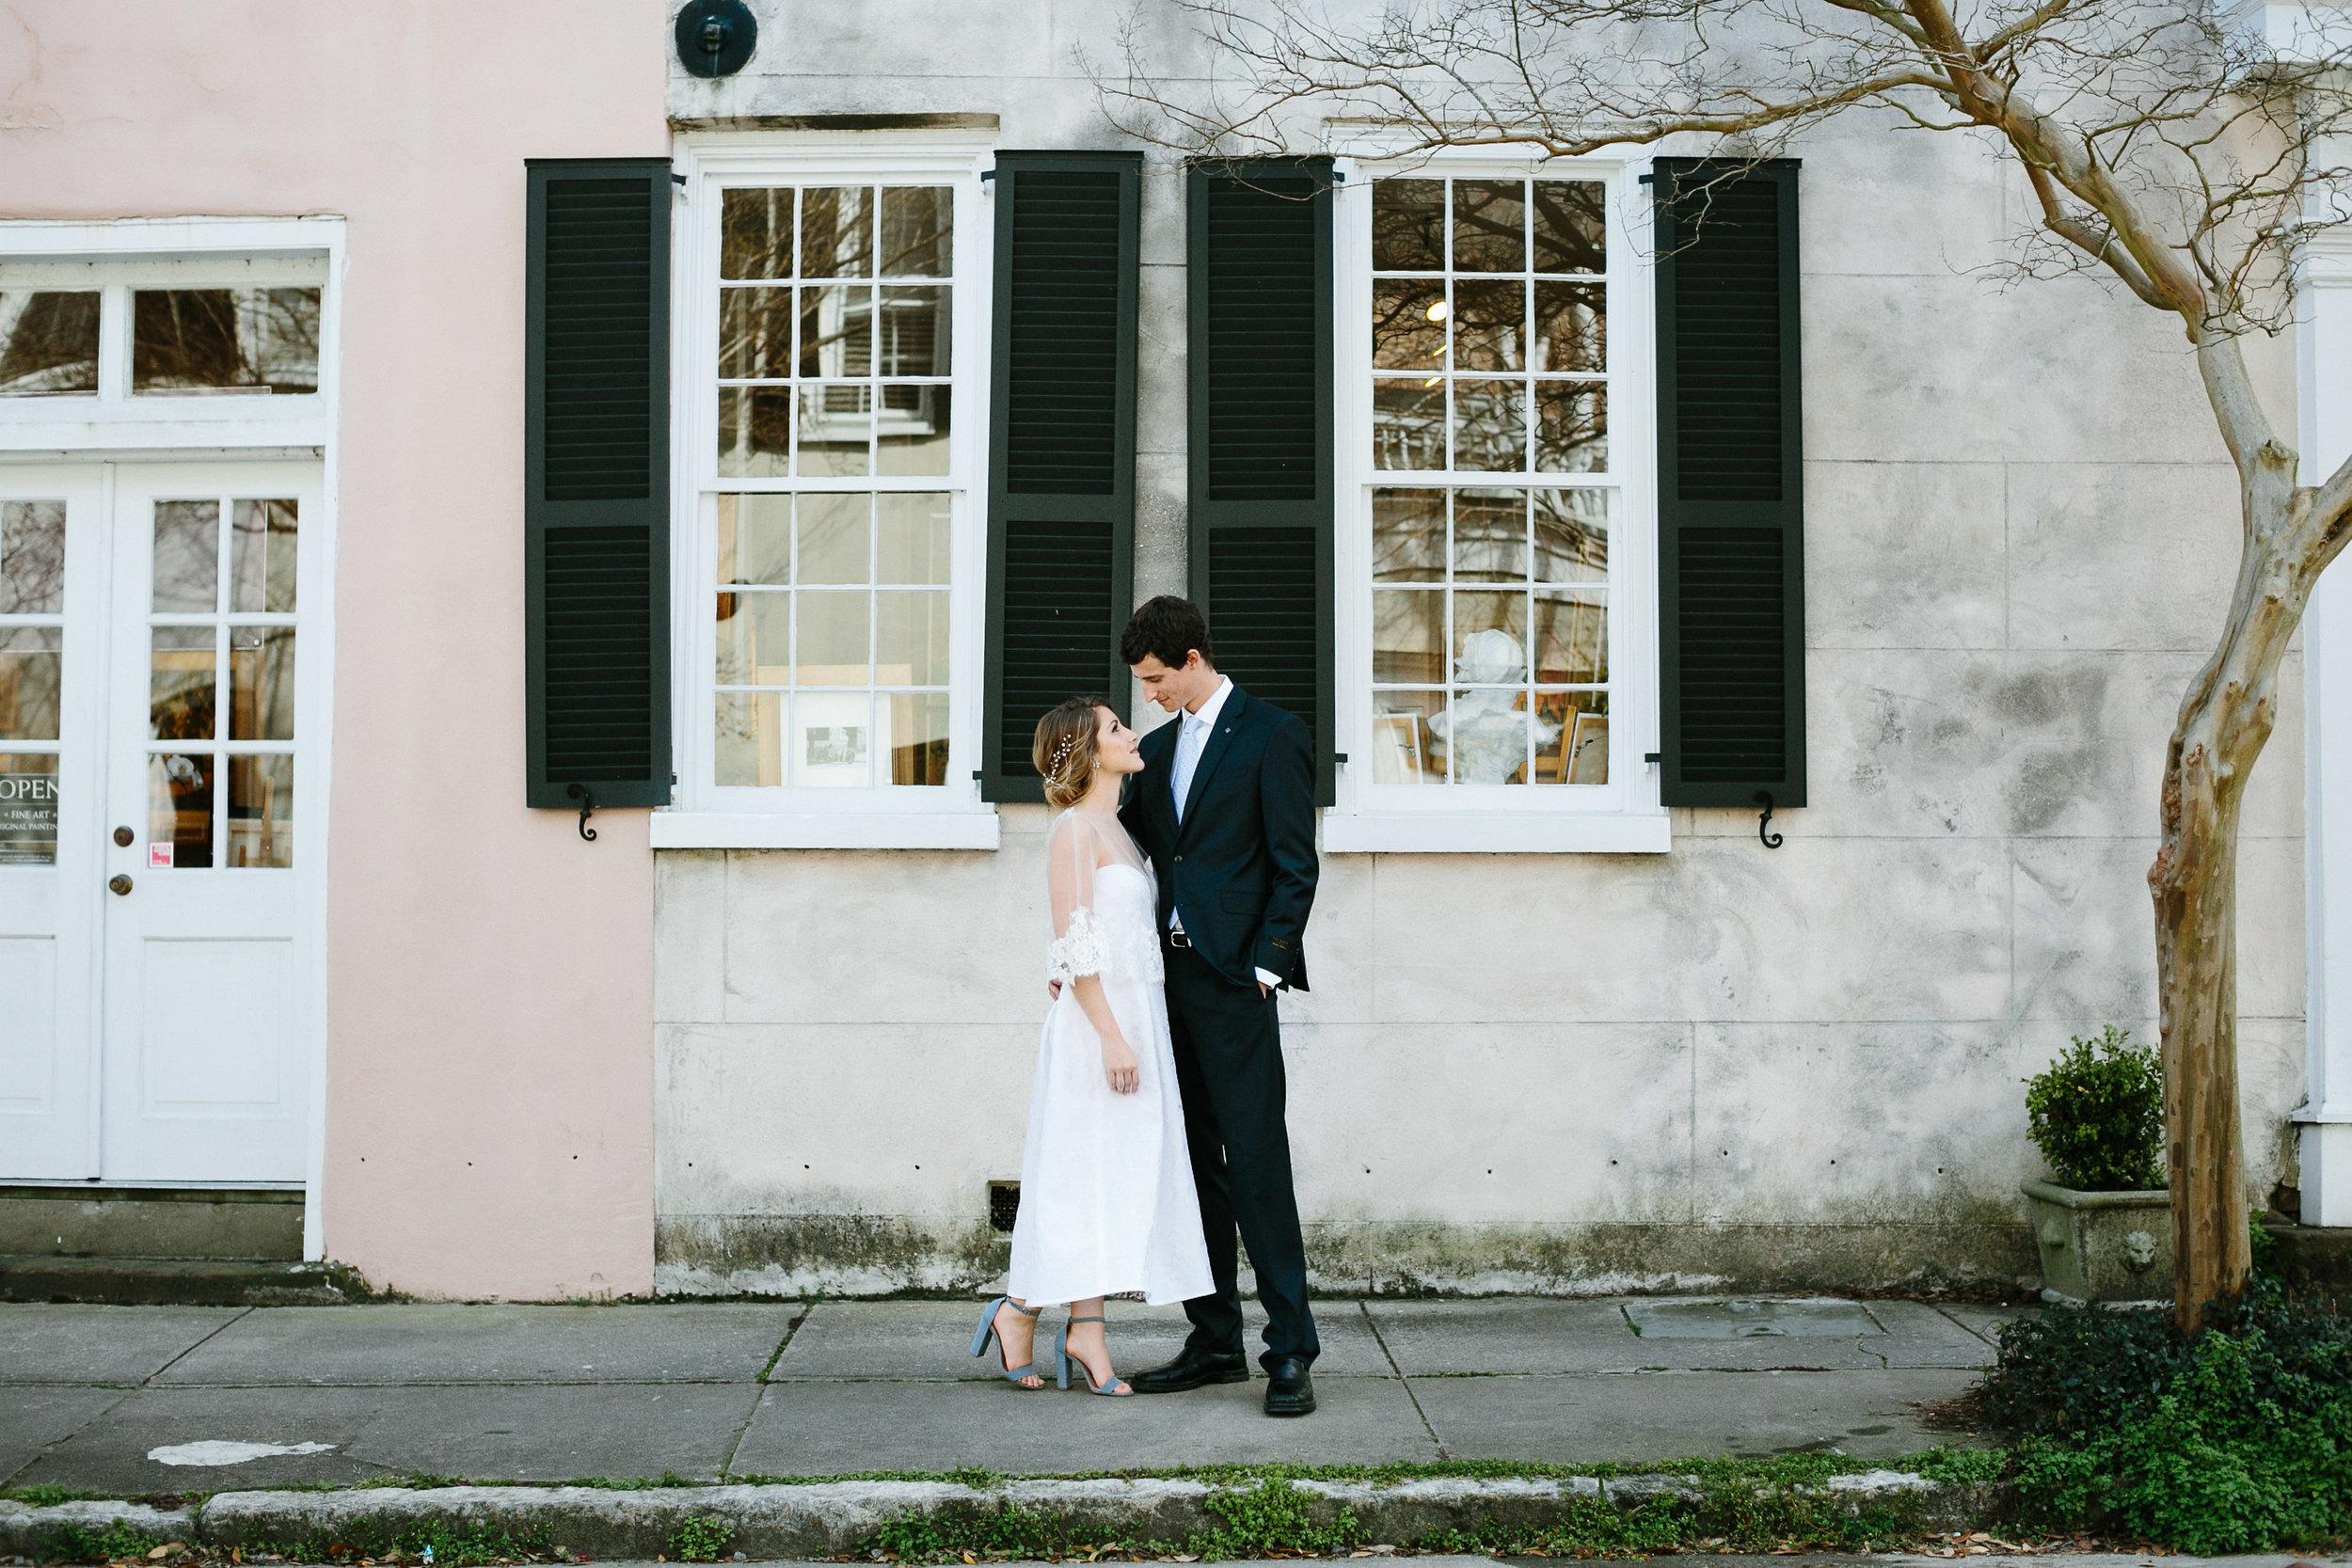 charleston-wedding-elopement-21.jpg